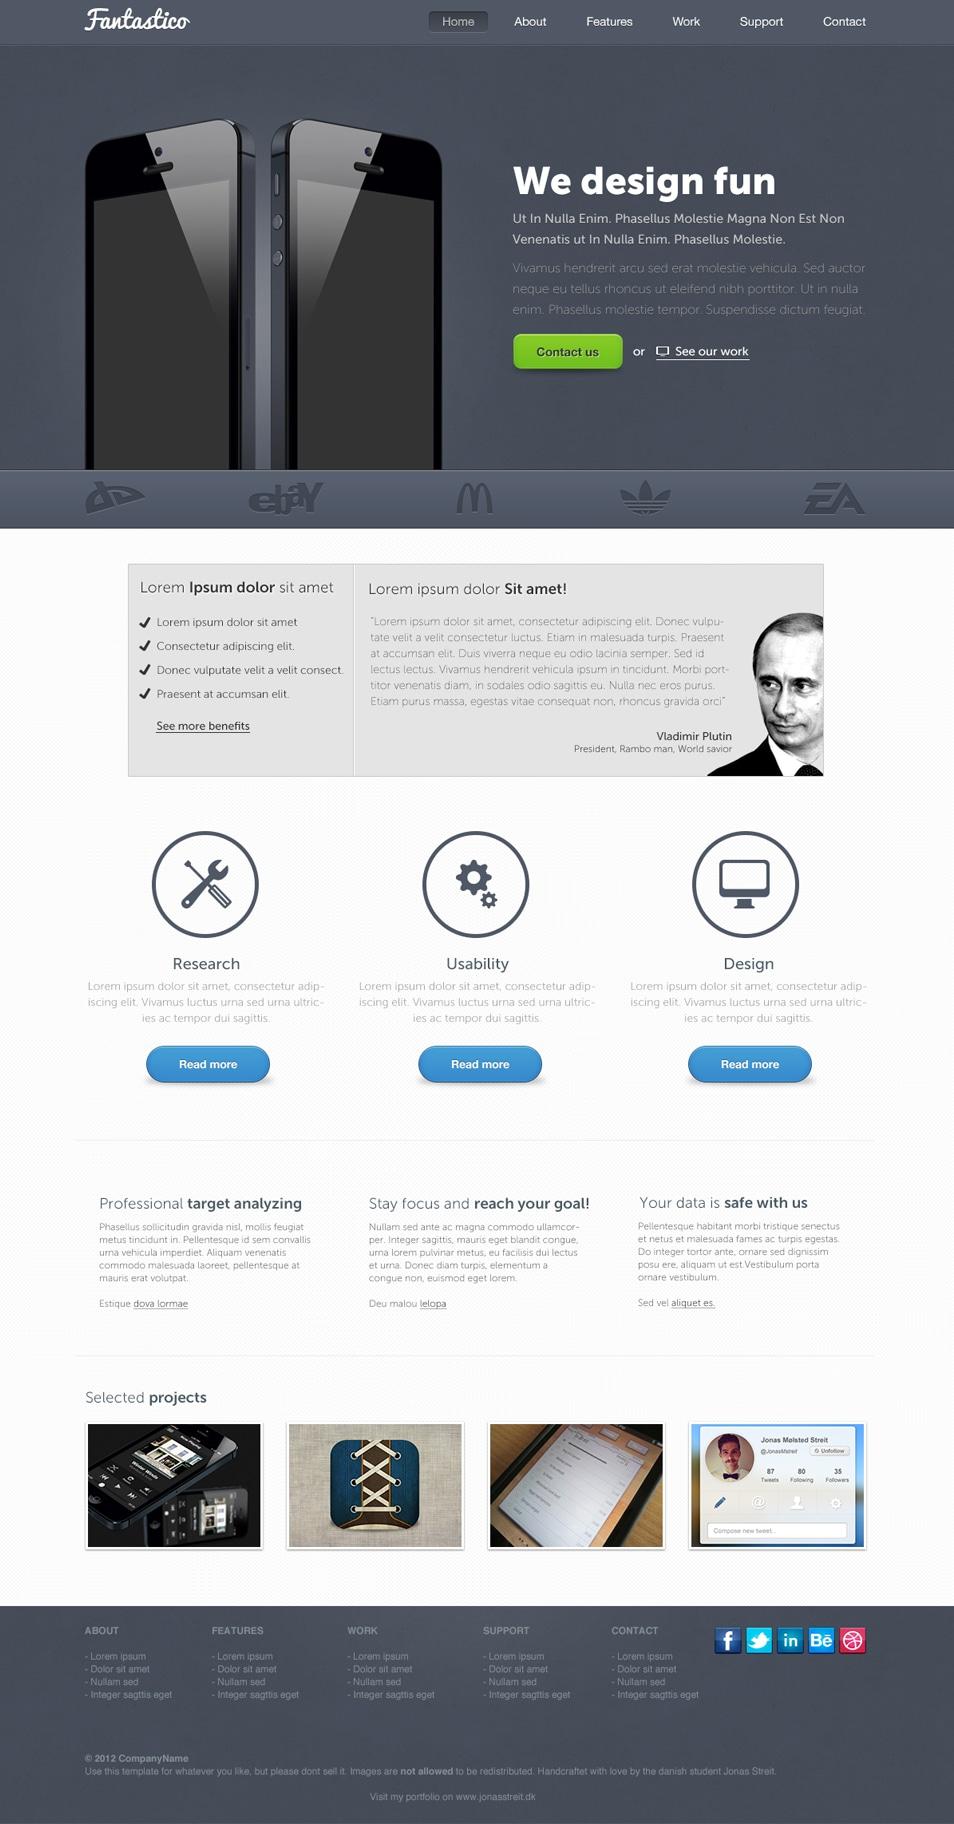 Fantastico - Free Landing Page